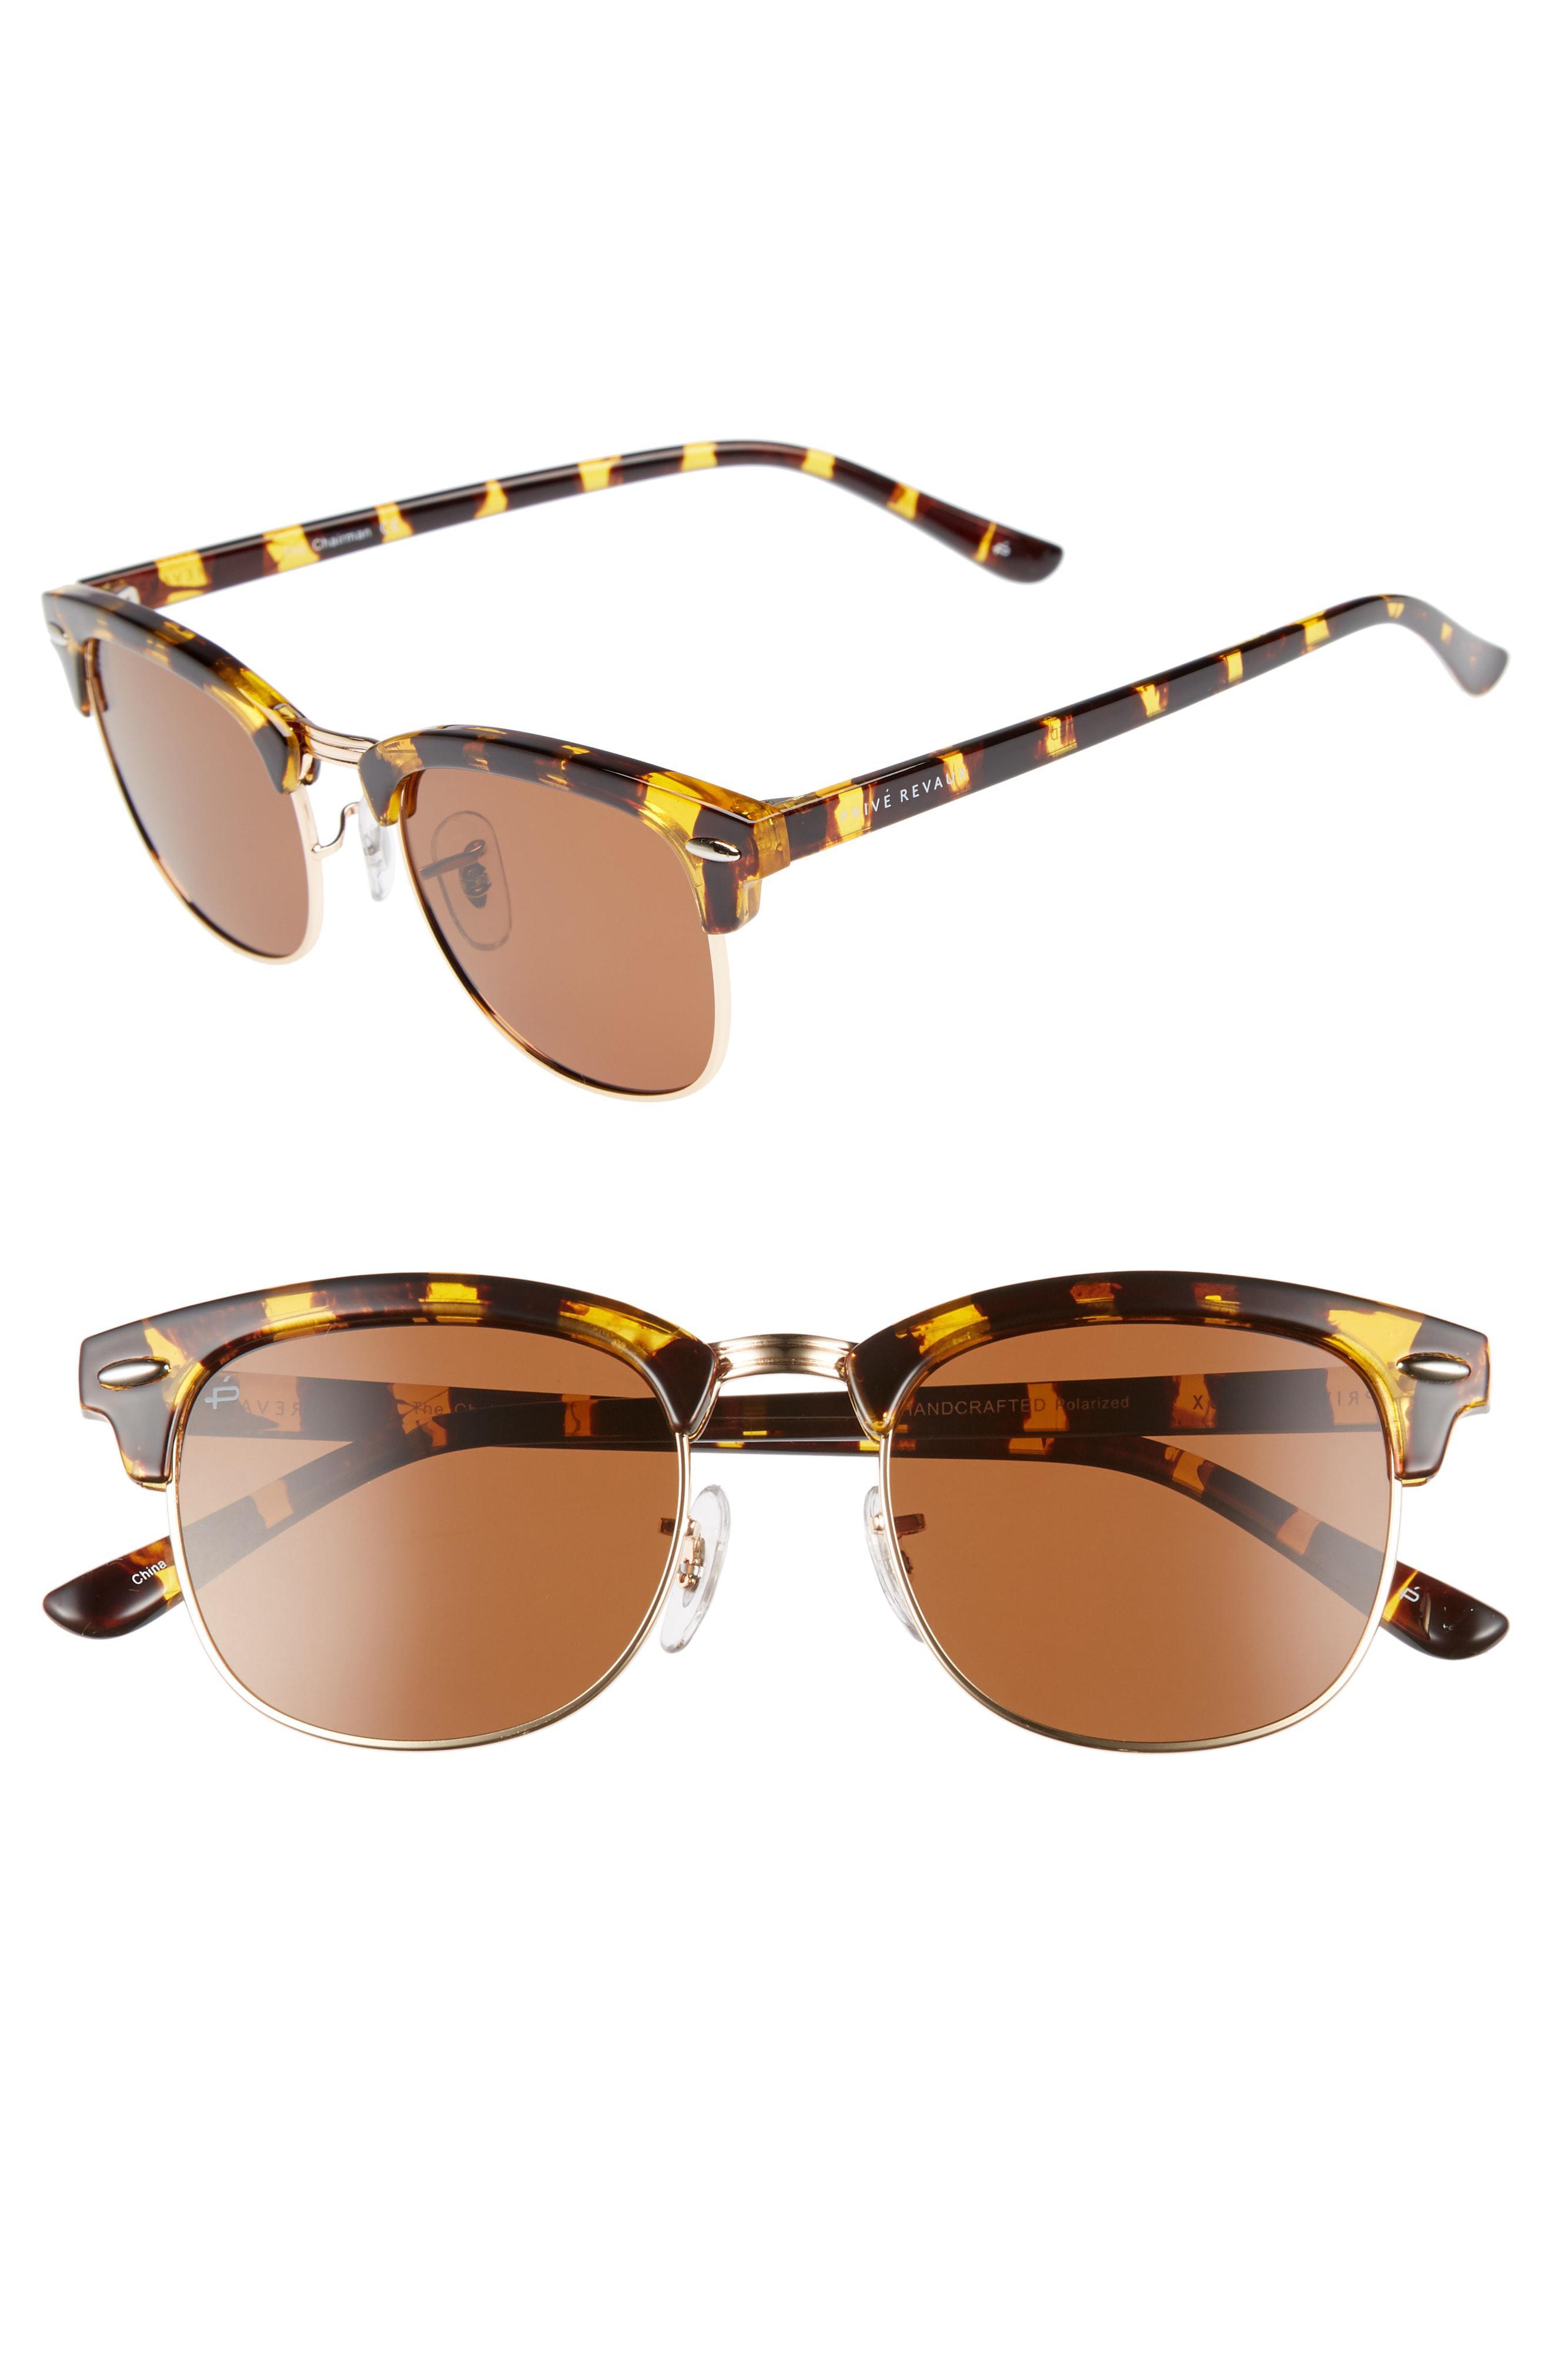 64b5e5343d Privé Revaux. Men s Metallic The Chairman 52mm Polarized Browline Sunglasses  -